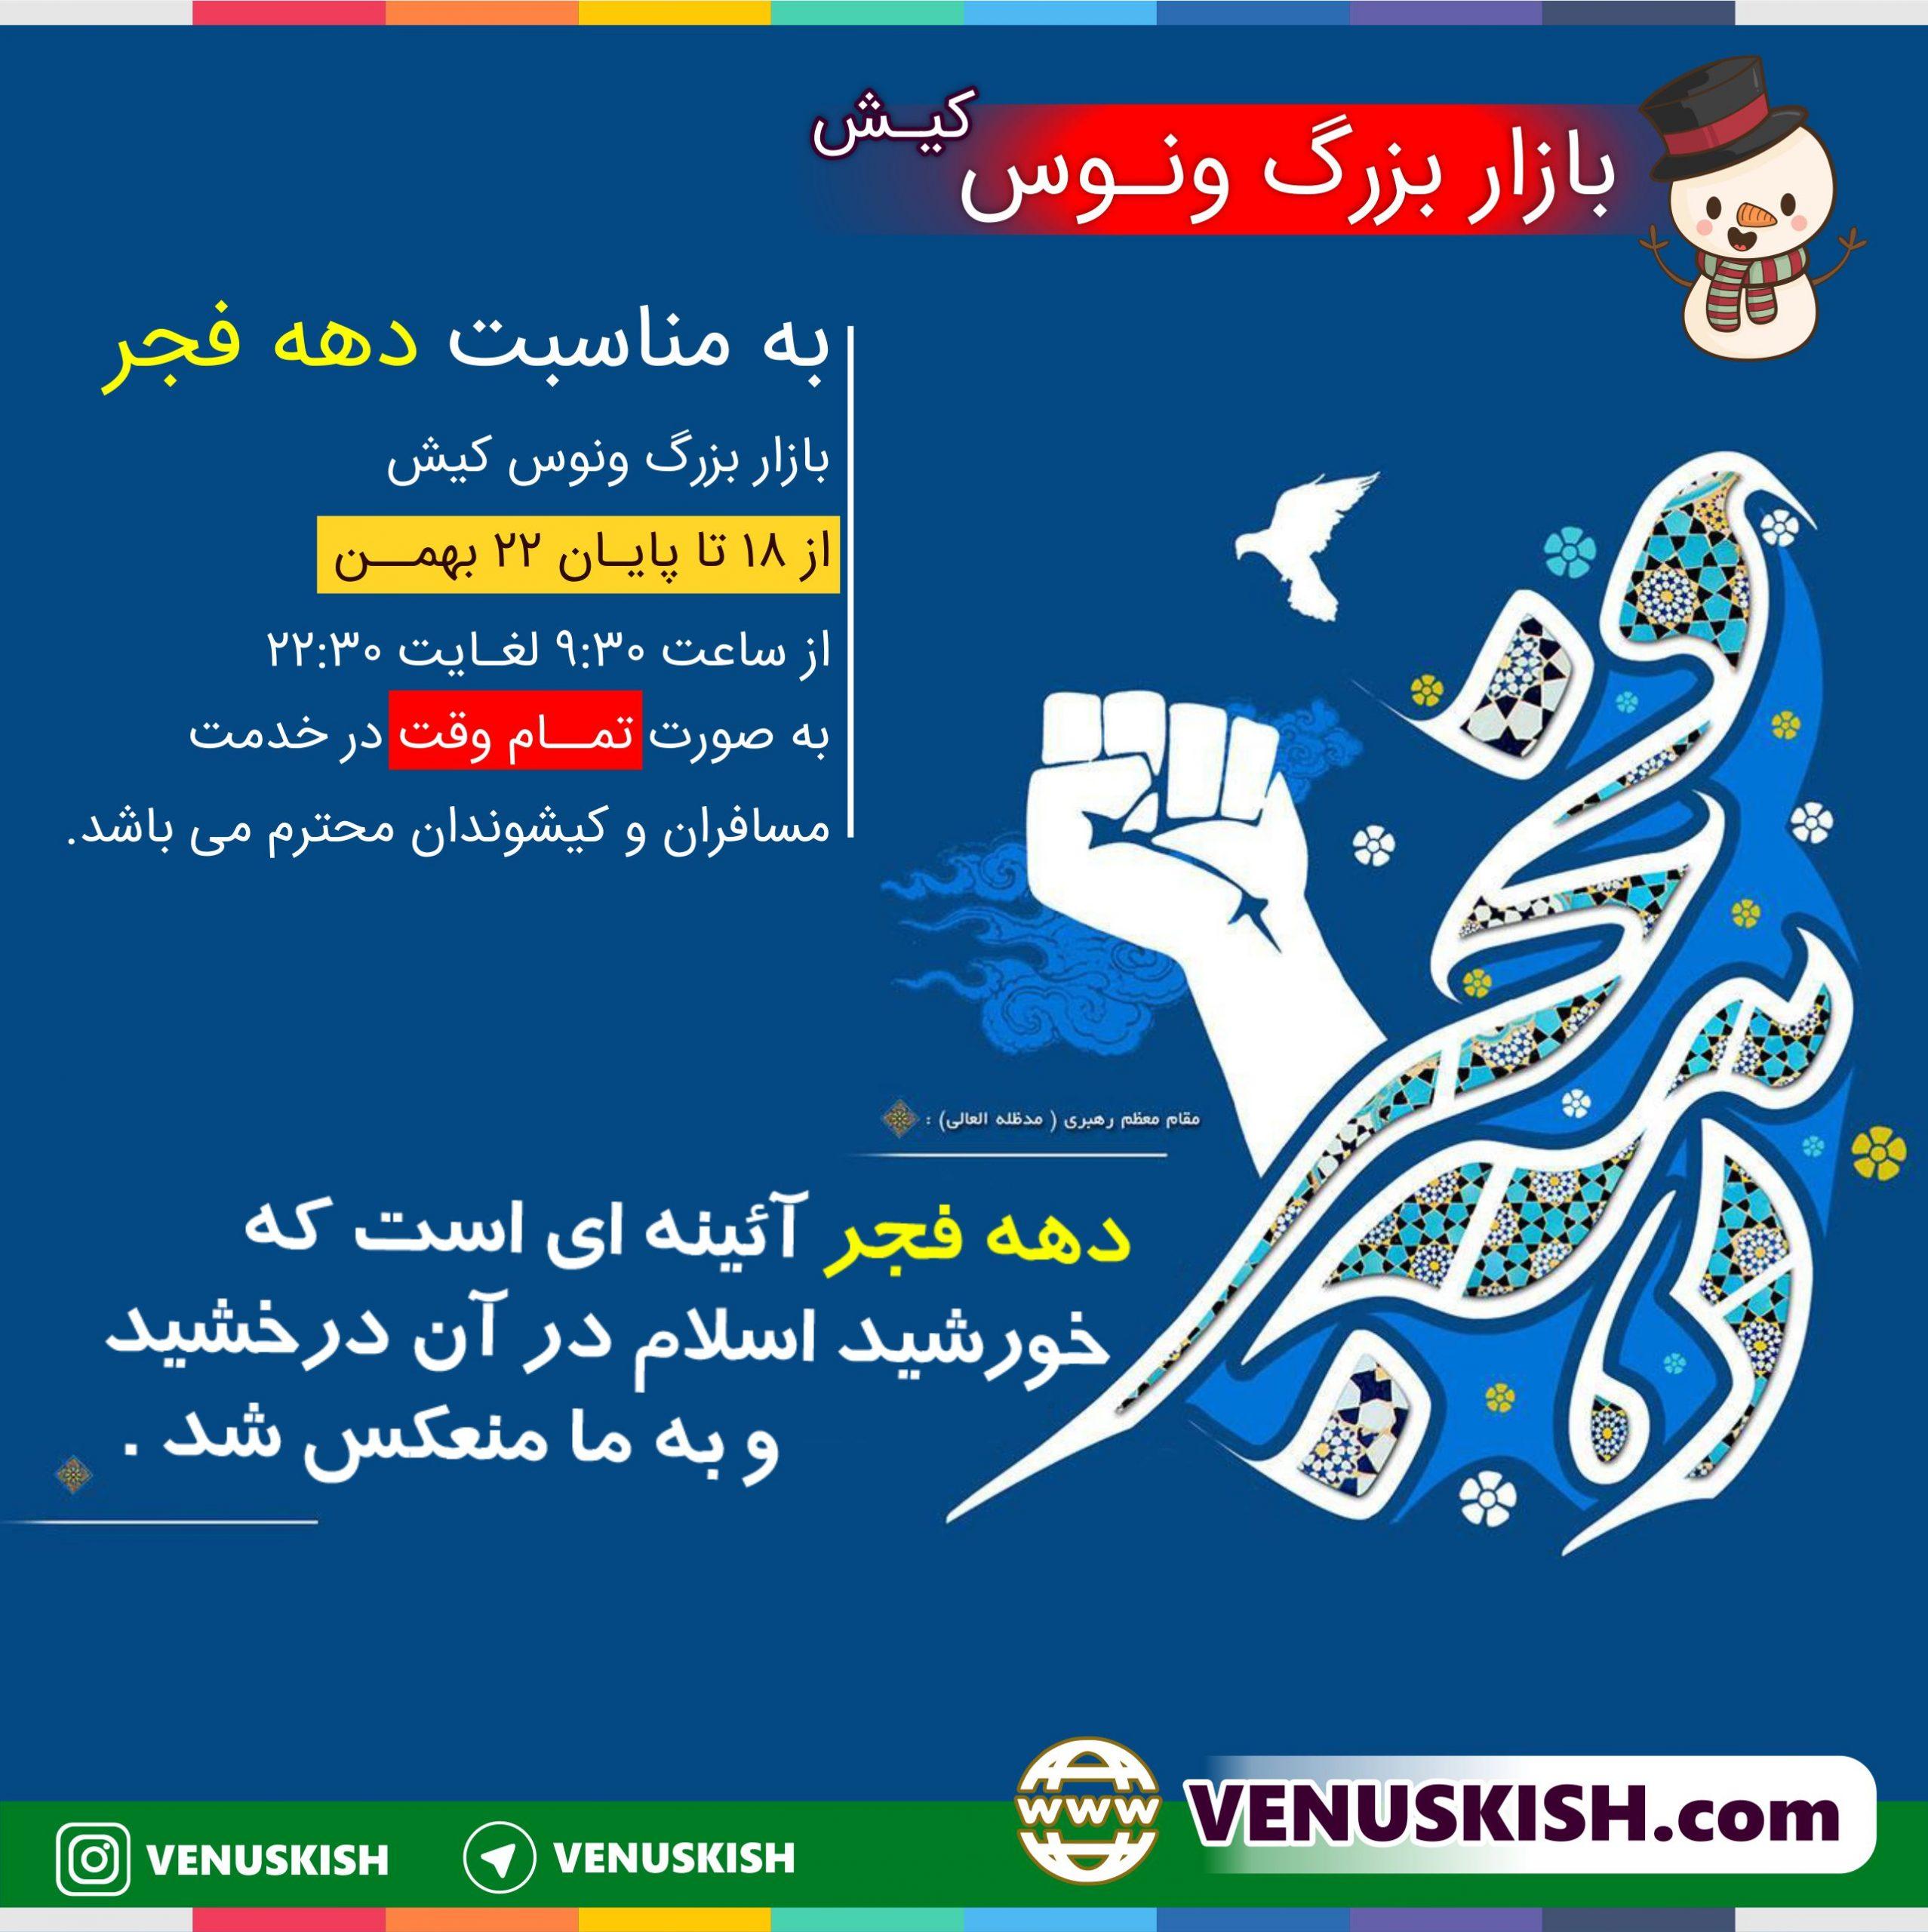 دهه فجر انقلاب اسلامی 🇮🇷